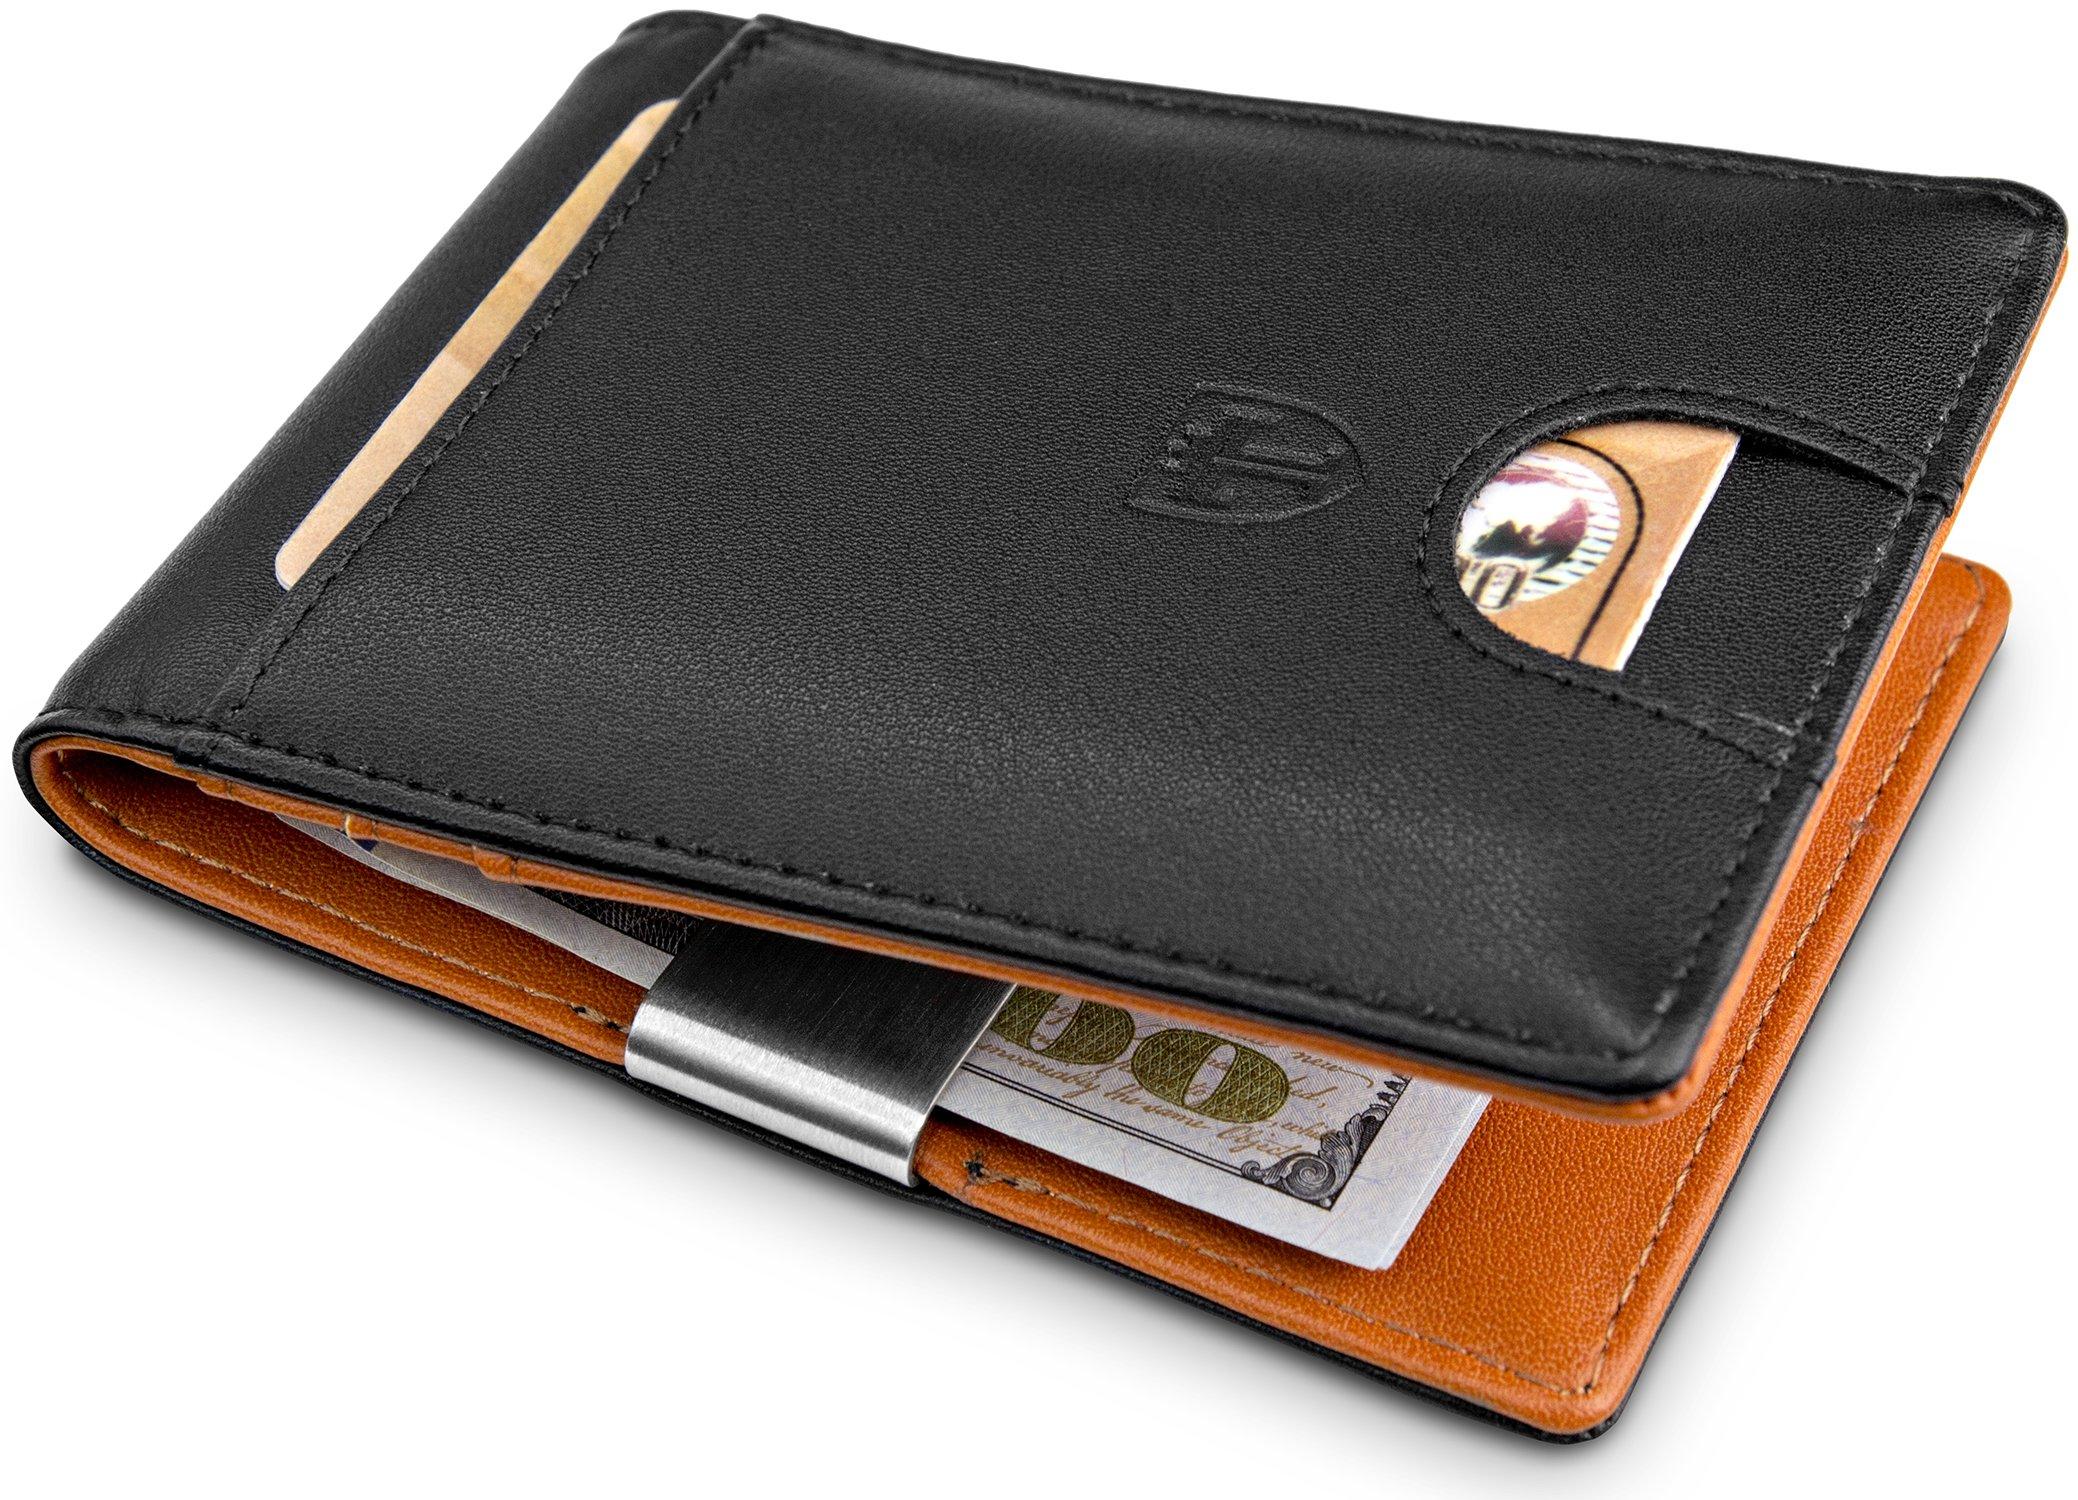 TRAVANDO Money Clip Wallet''SYDNEY'' RFID Blocking Wallet - 4 Card Pockets - Mini Credit Card Holder - Travel Slim Wallet - Minimalist Bifold Wallet for Men with Gift Box